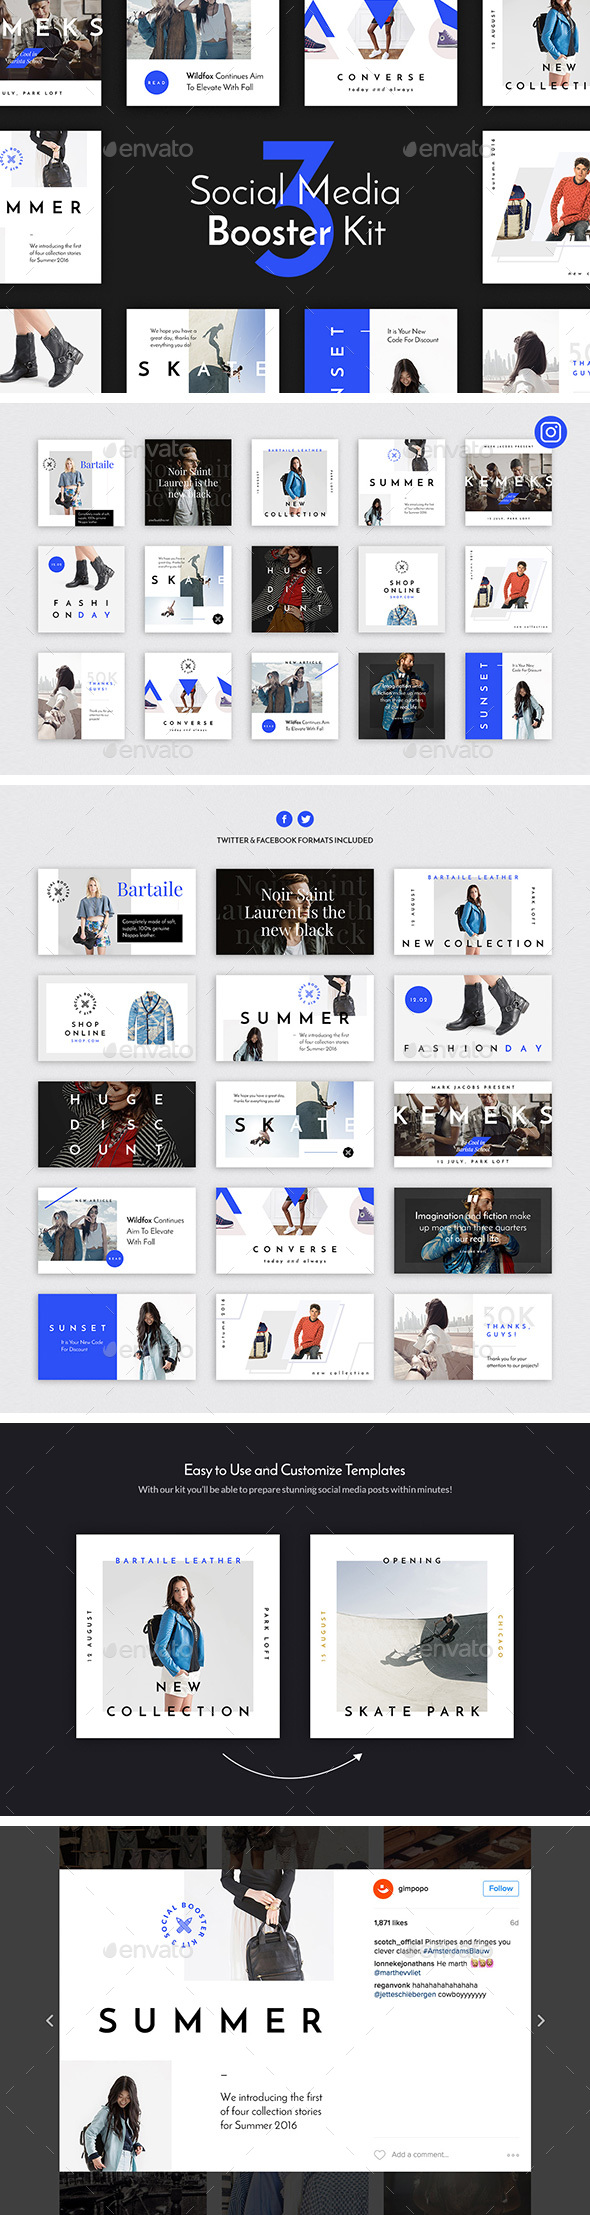 Social Media Booster Kit 3 Instagram Twitter Facebook Templates